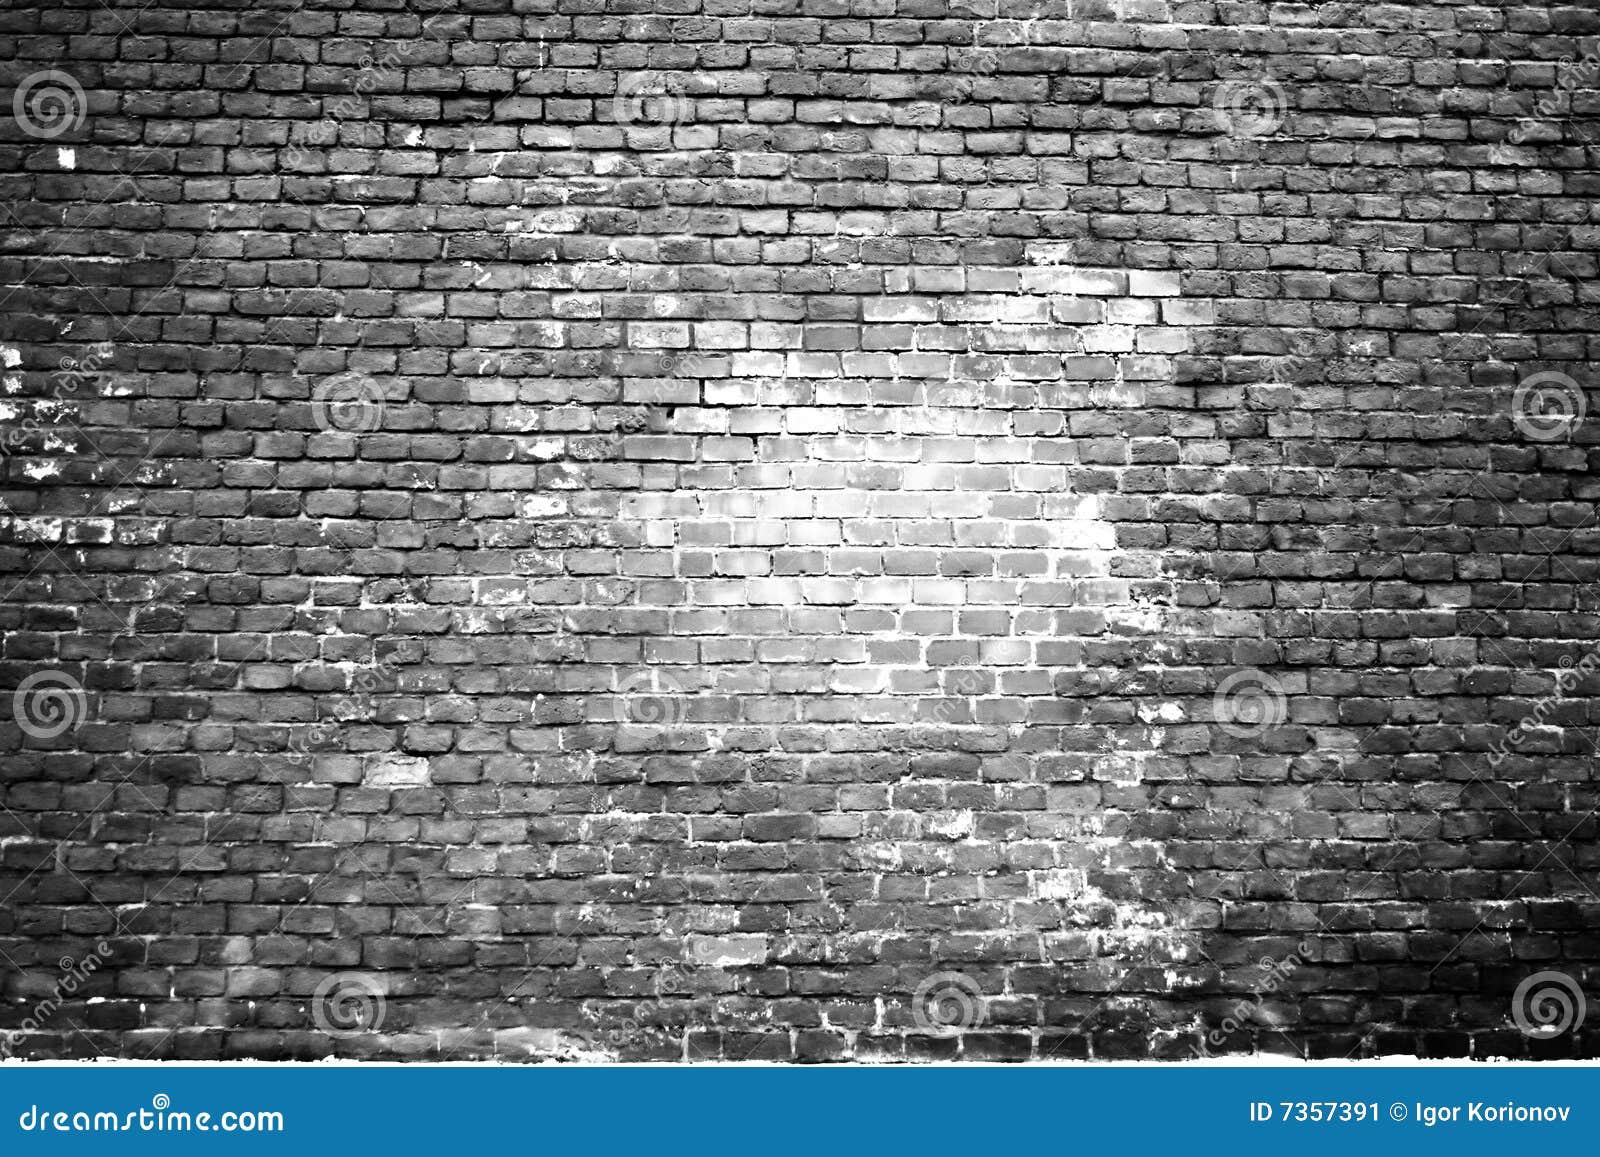 Textura de la pared de ladrillo blanca vieja chamuscada